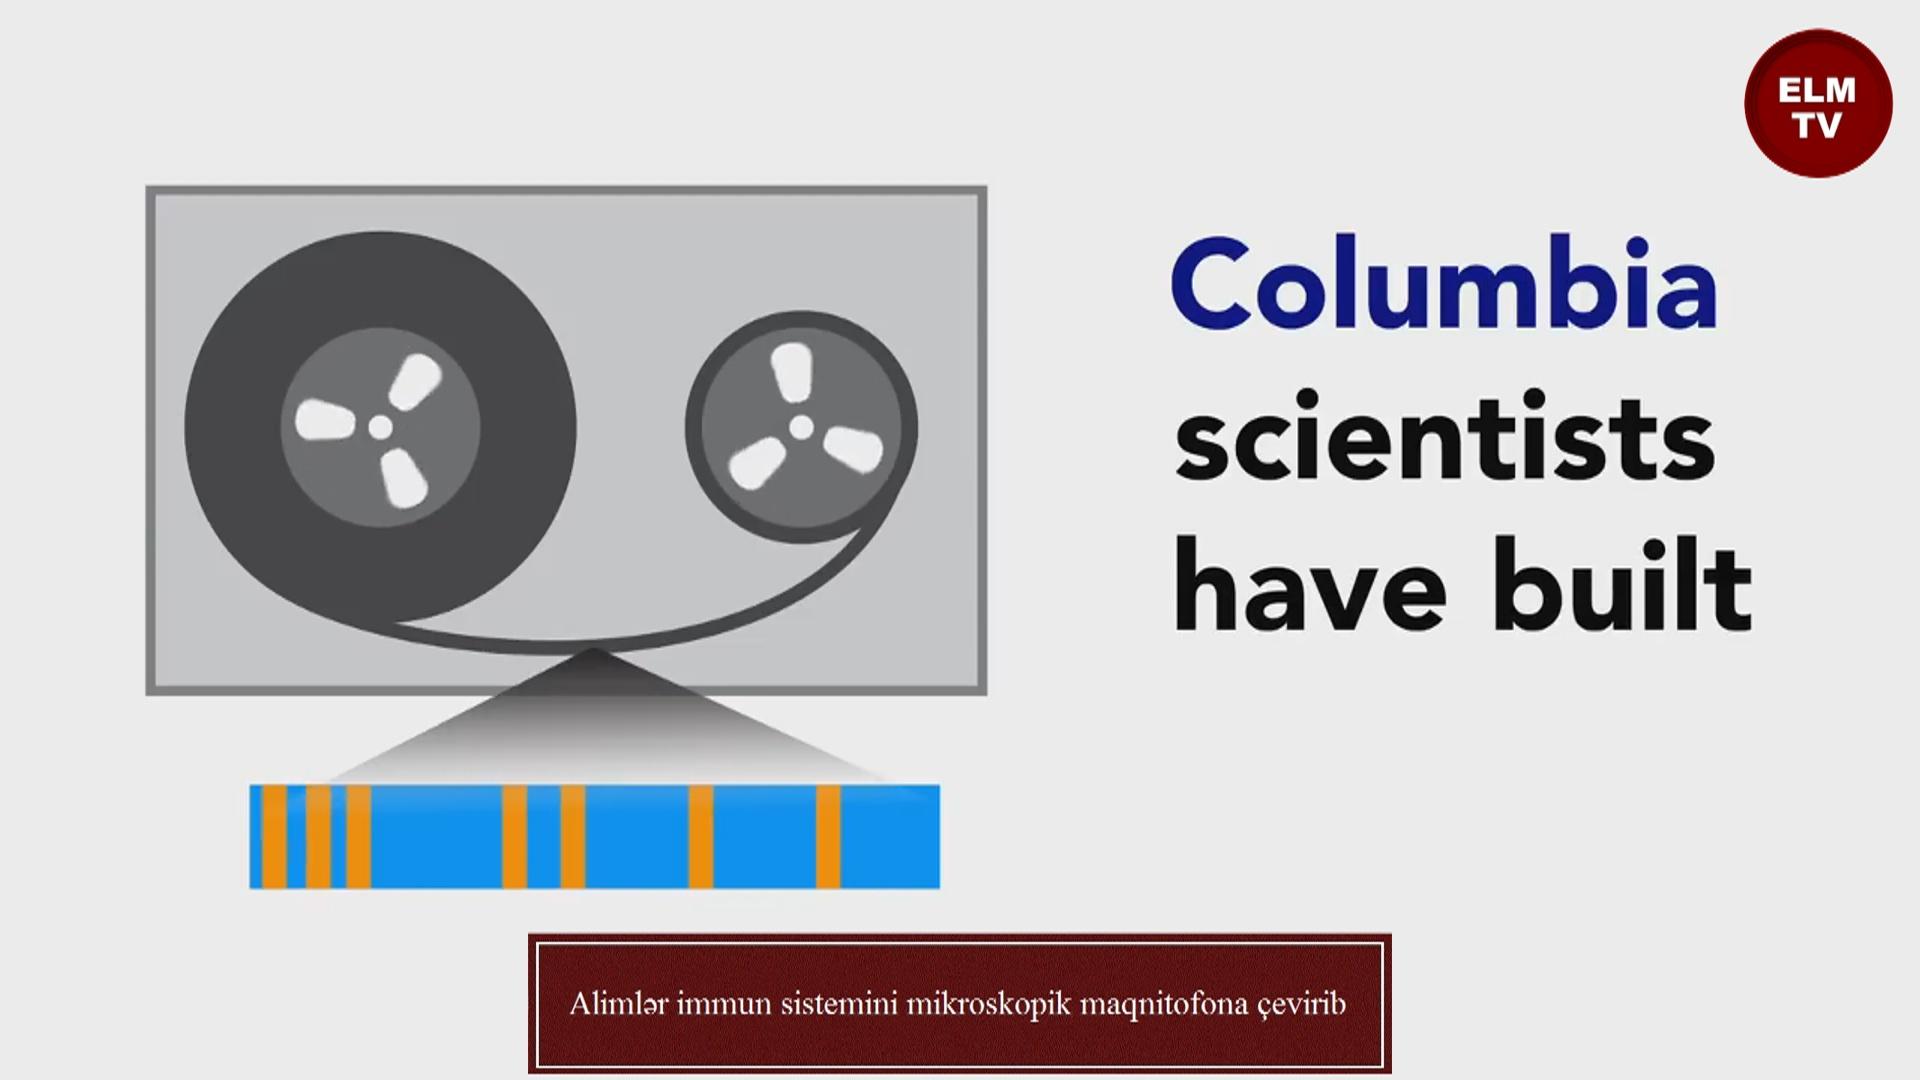 Alimlər immun sistemini mikroskopik maqnitofona çevirib